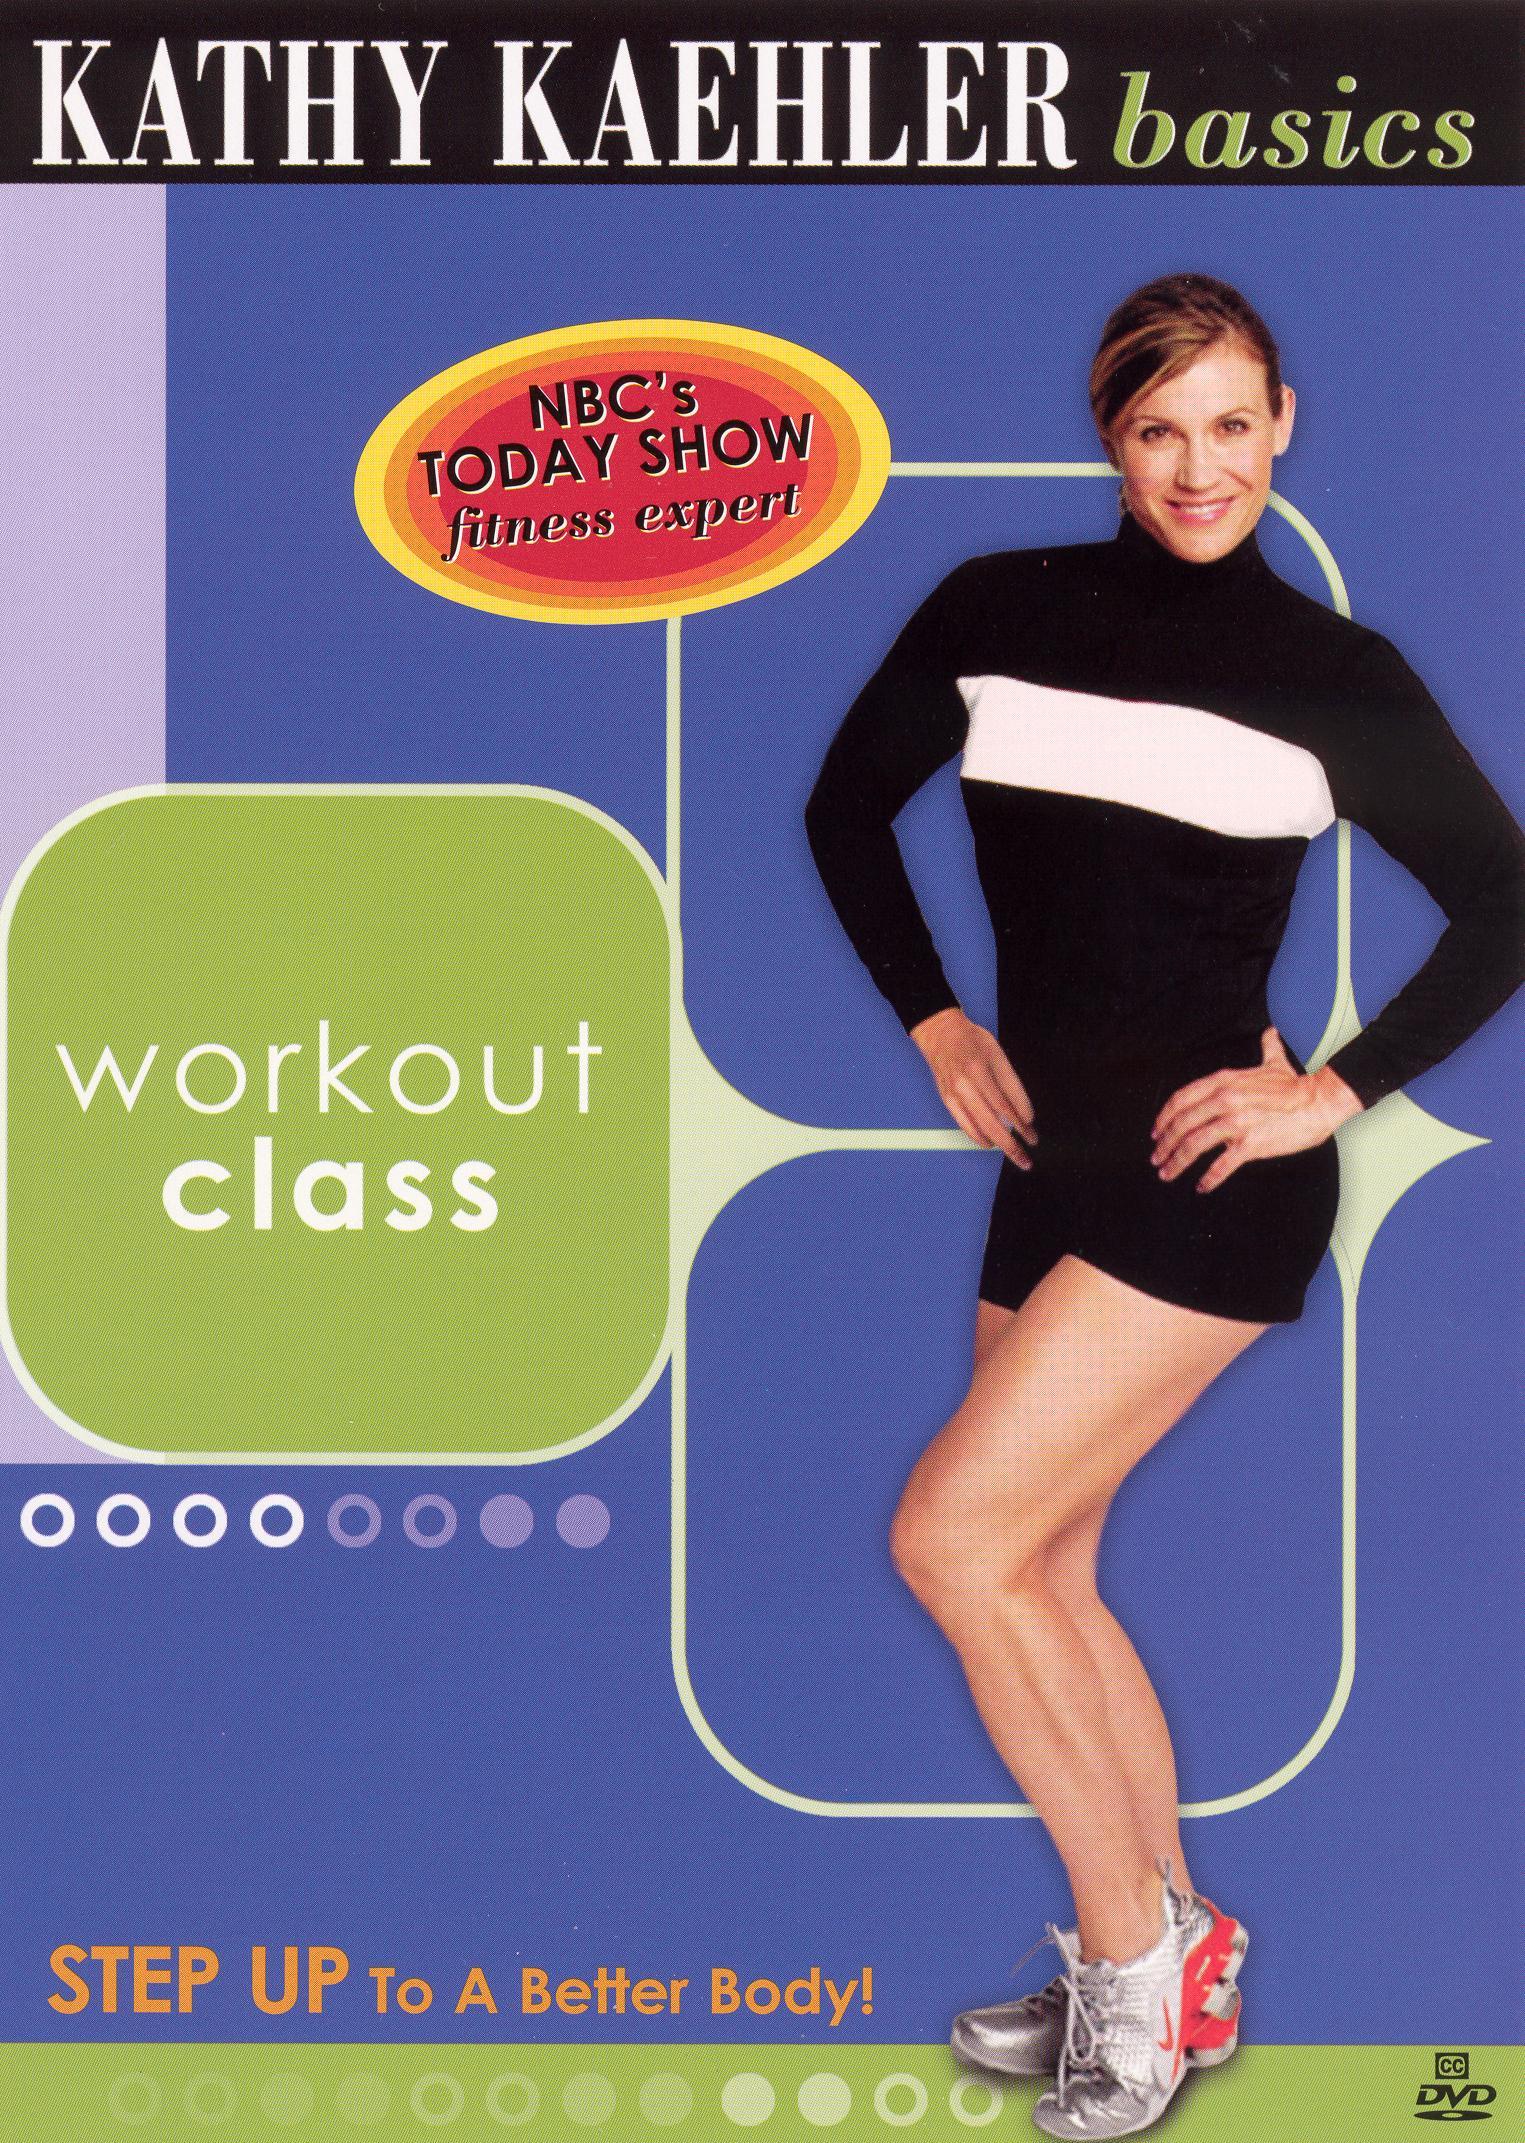 Kathy Kaehler Basics: Workout Class